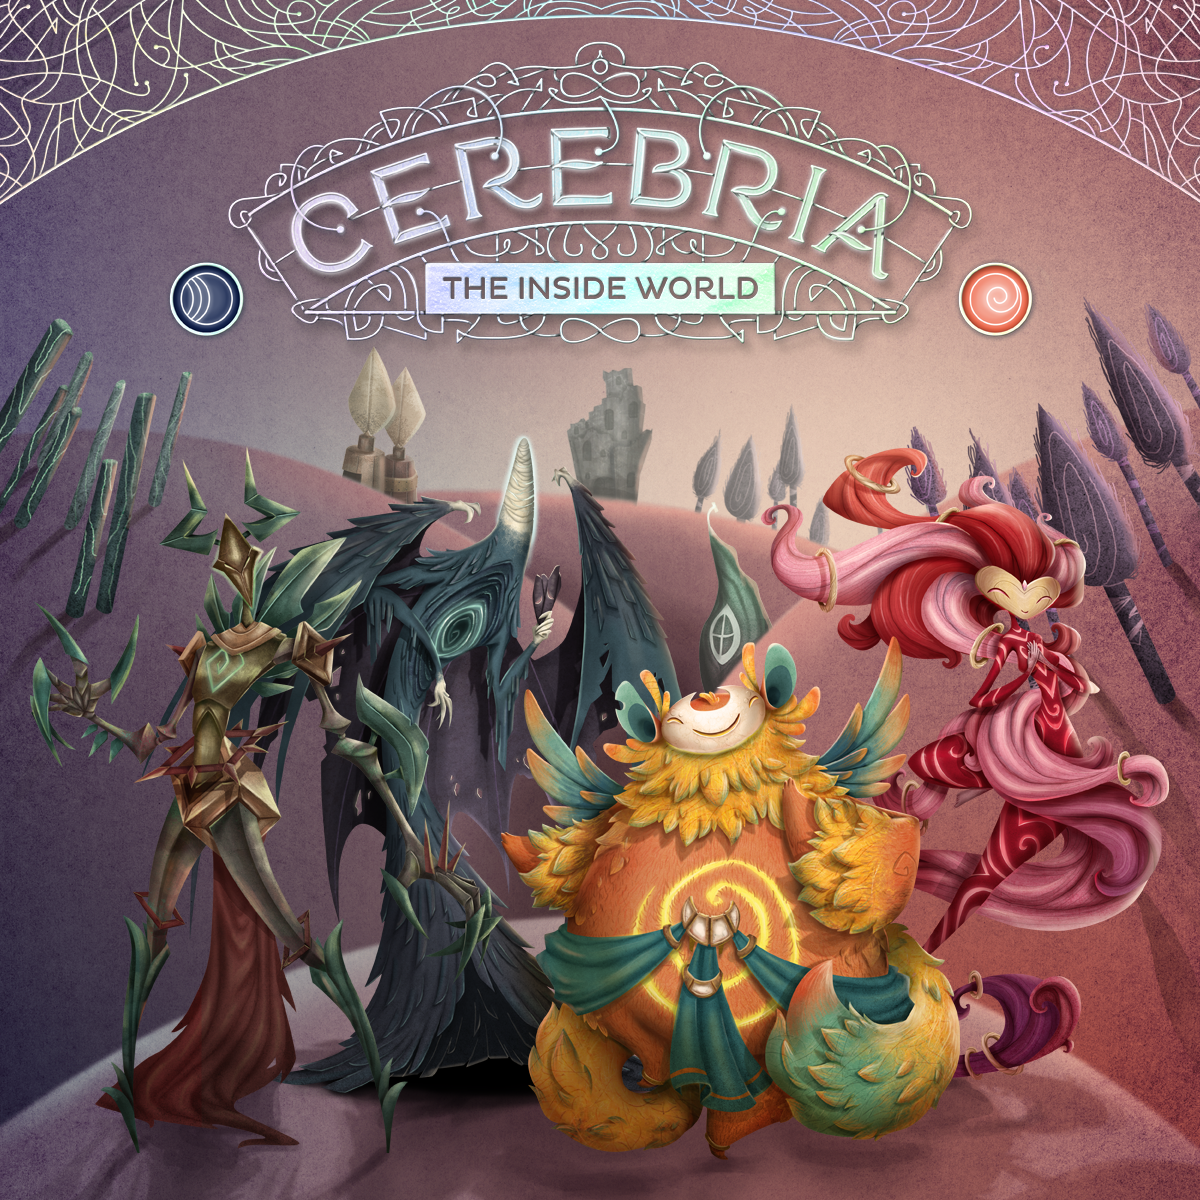 Main image for Cerebria: The Inside World